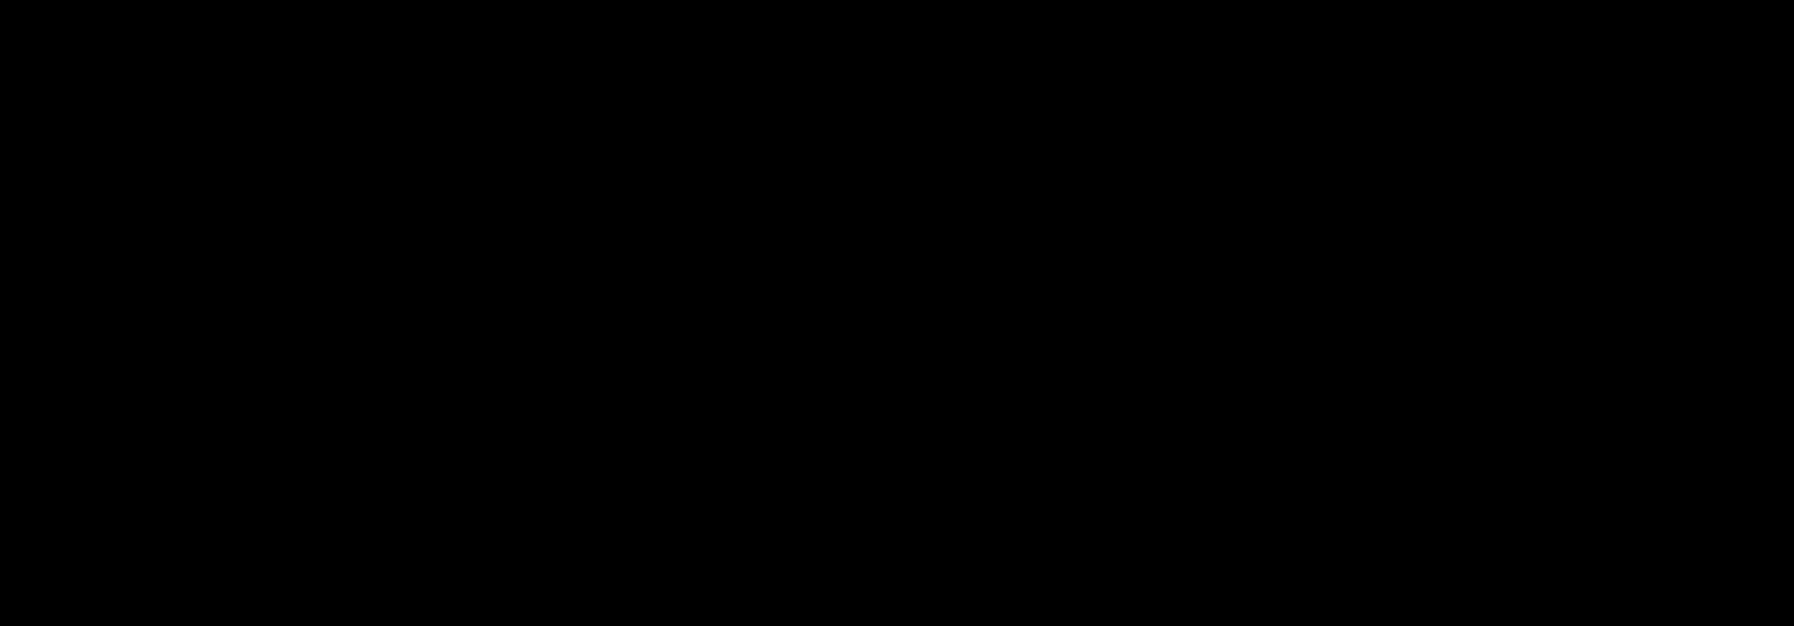 DL-Lauroylcarnitine Chloride